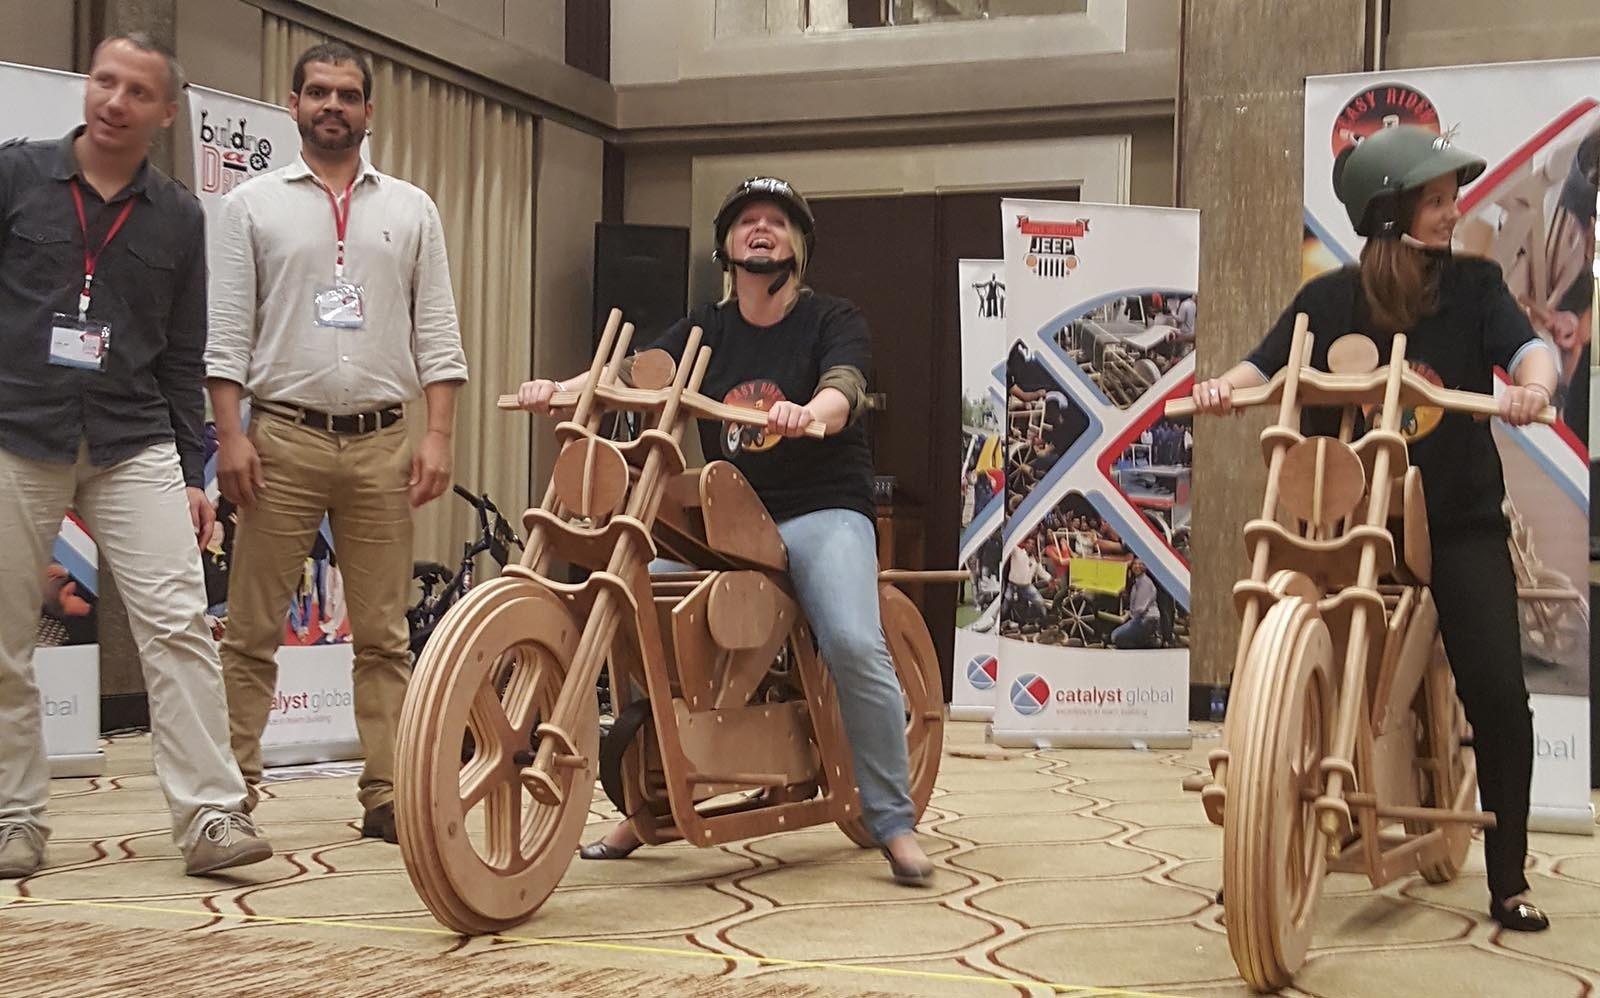 Jako vrcholne cislo celeho programu Easy Rider prichazi zavod na strojich ktere si teamy spolecne vytvorili